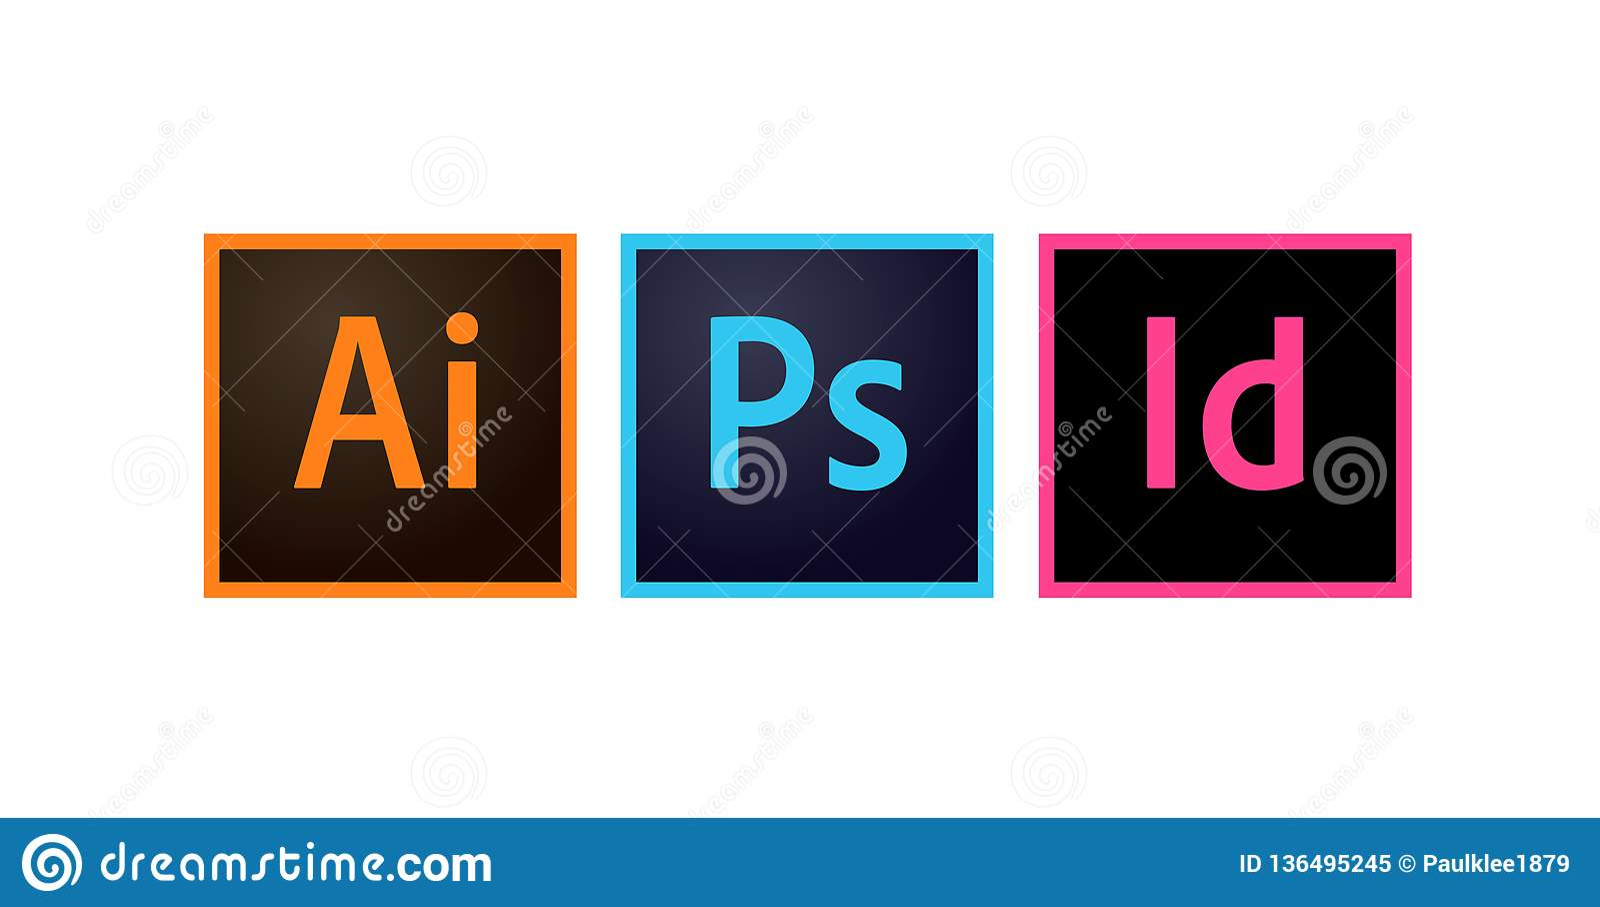 Ícones Photoshop de Adobe, ilustrador e vetor editorial de Indesign